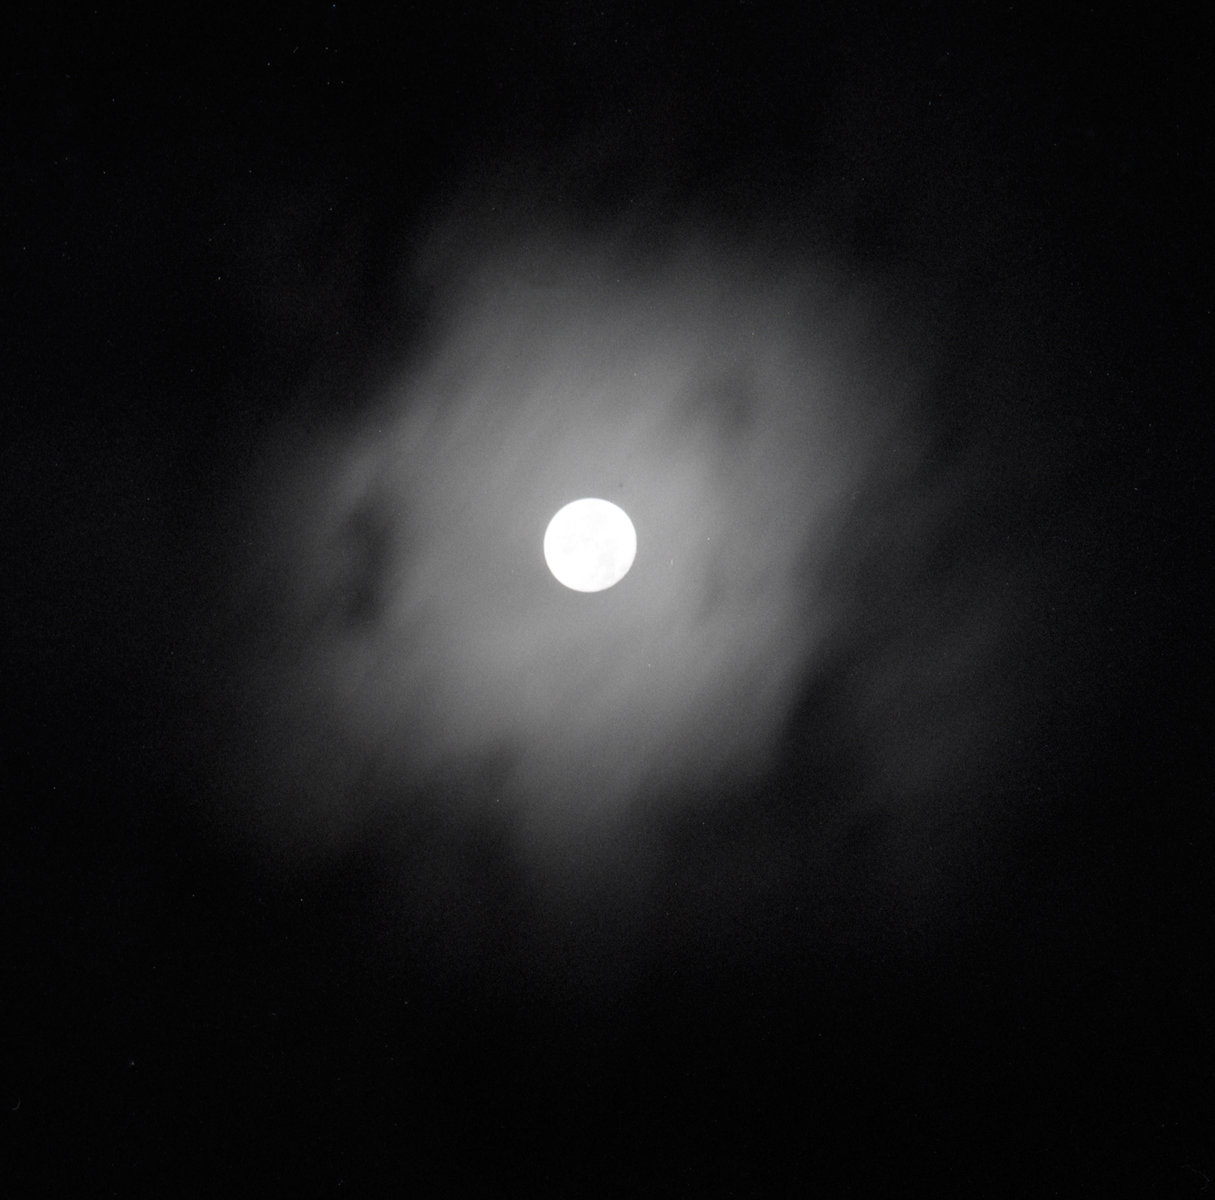 Moon2_full.thumb.jpg.695a287c191fd68f9e75d13c1b396805.jpg